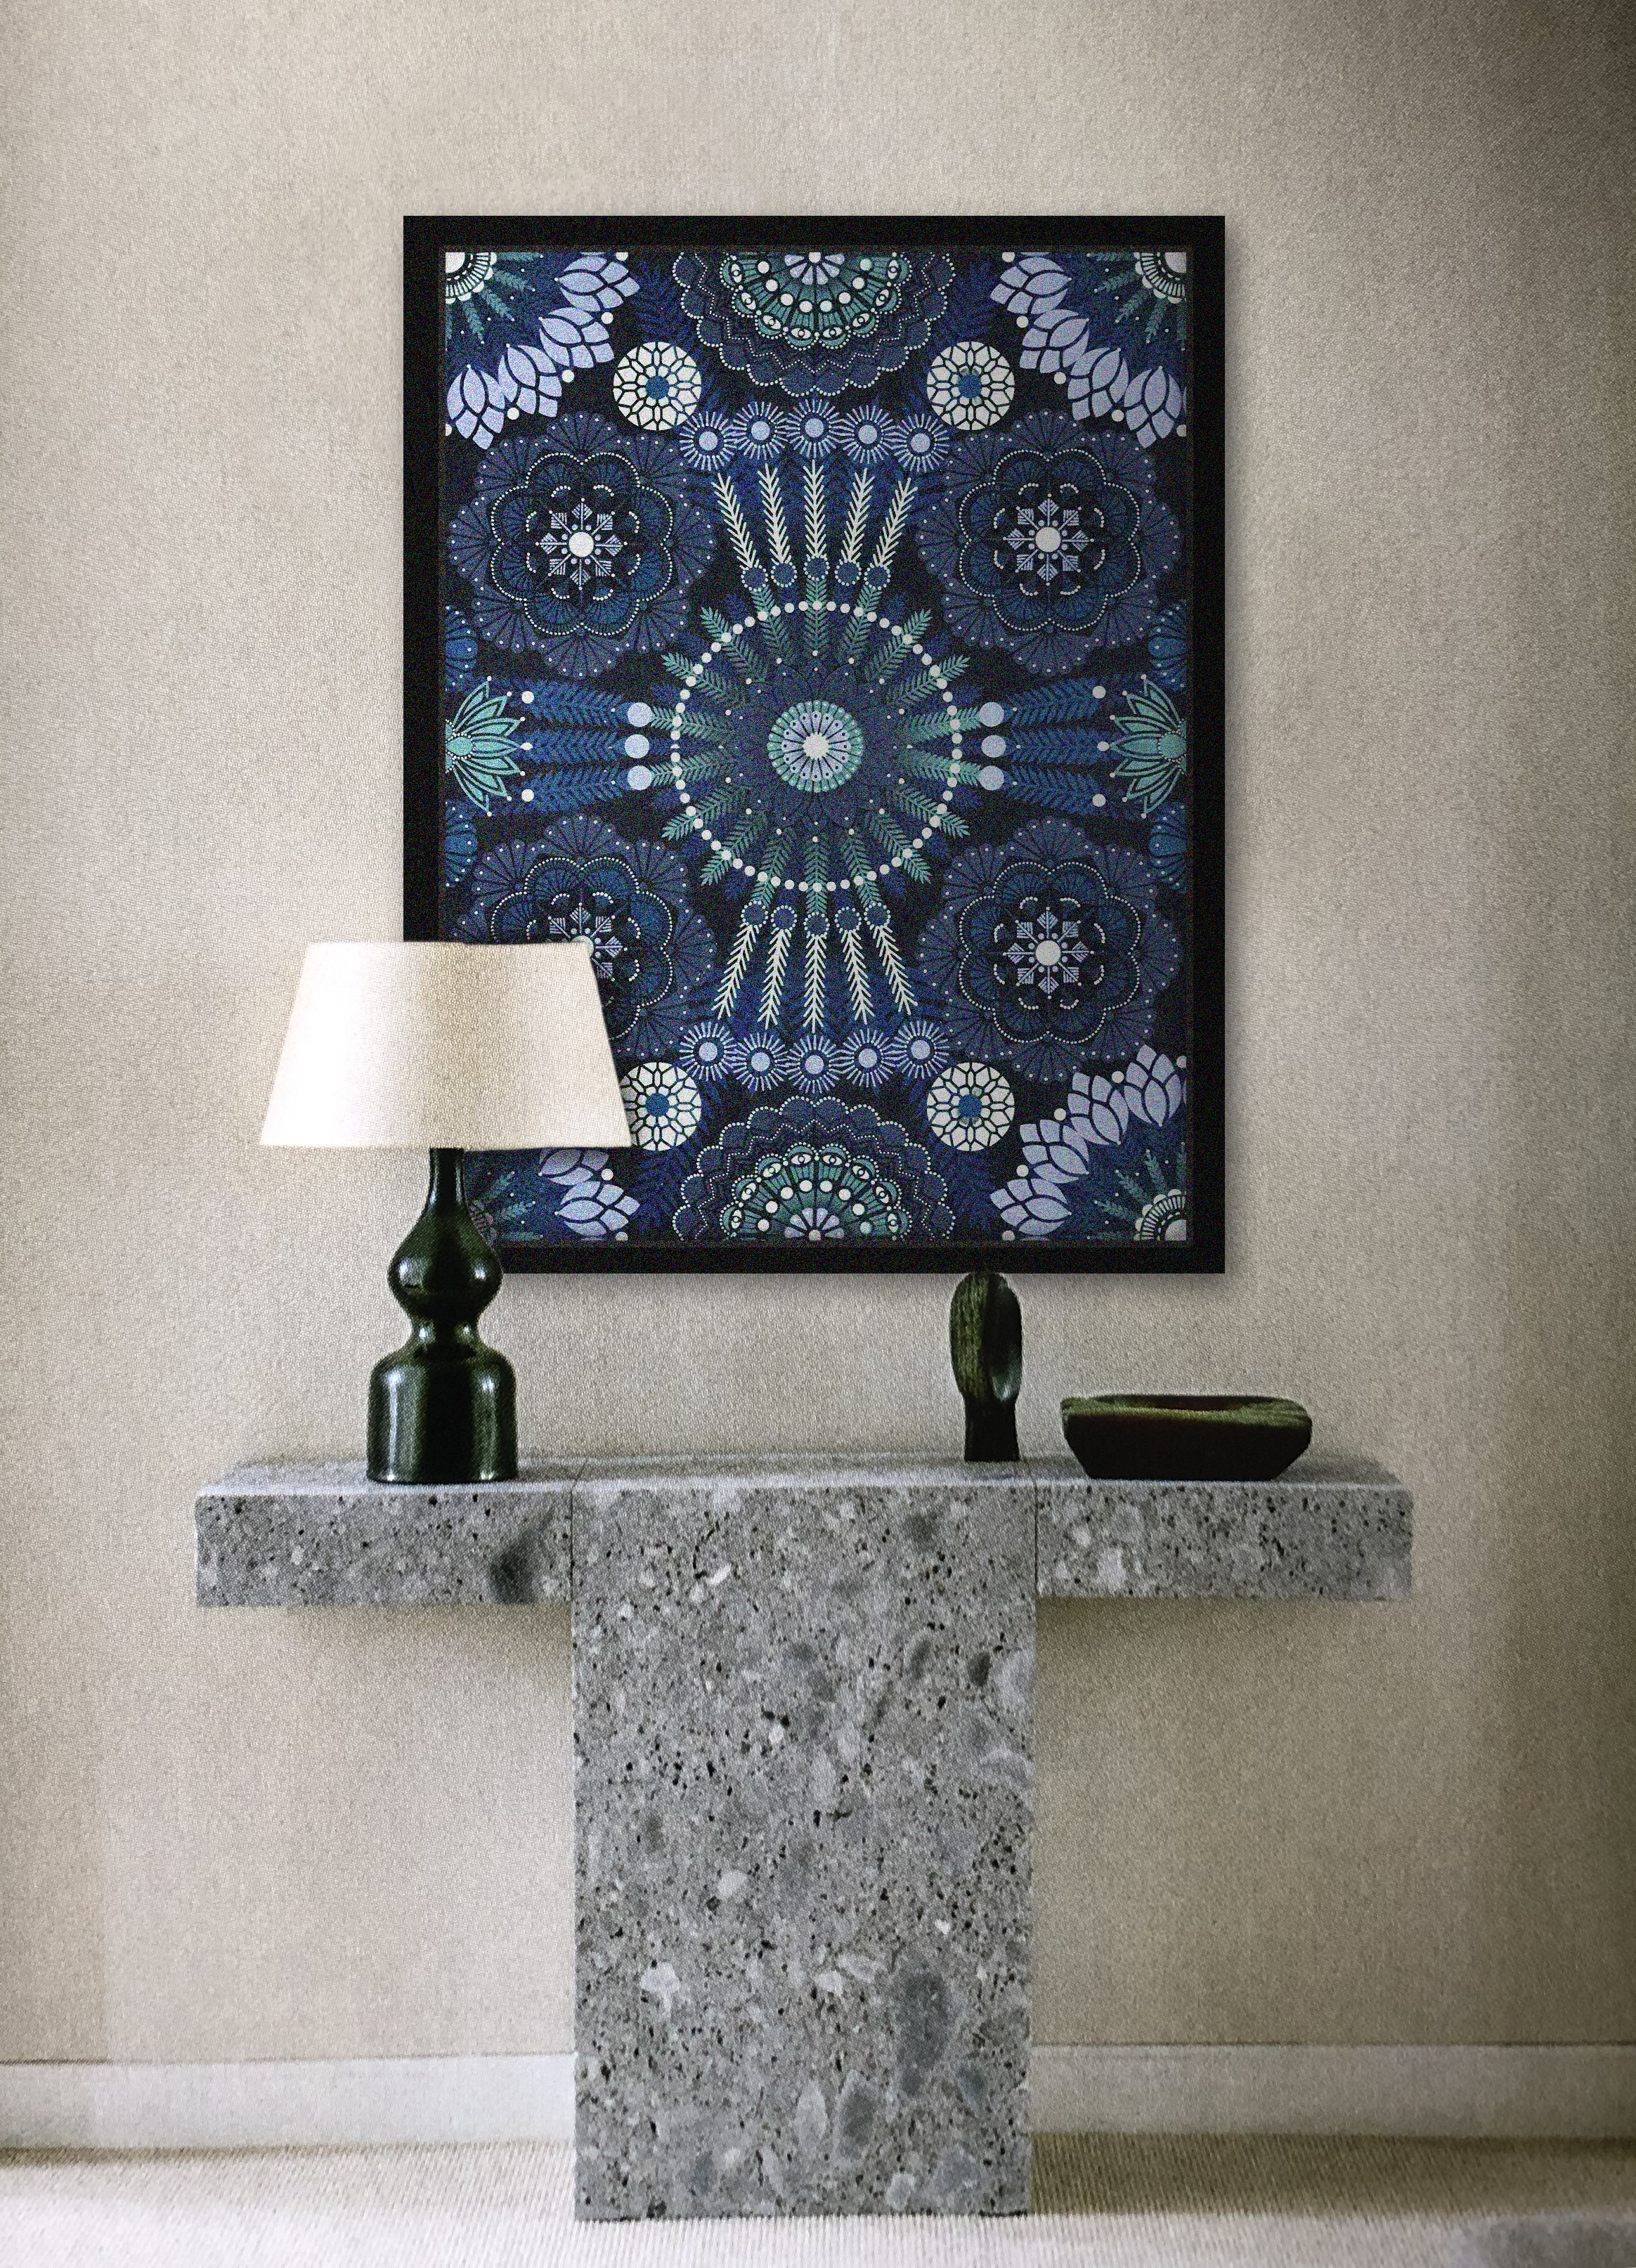 Kaleidoscopic Nature Sapphire  - Acrylic on canvas, 60 x 80 cm | 2018 *  Photo-montage w/ AD Magazine | janv-fev 2019 - P.105 | Emmanuel de Bayser, Paris FR.  |  Christian Kain